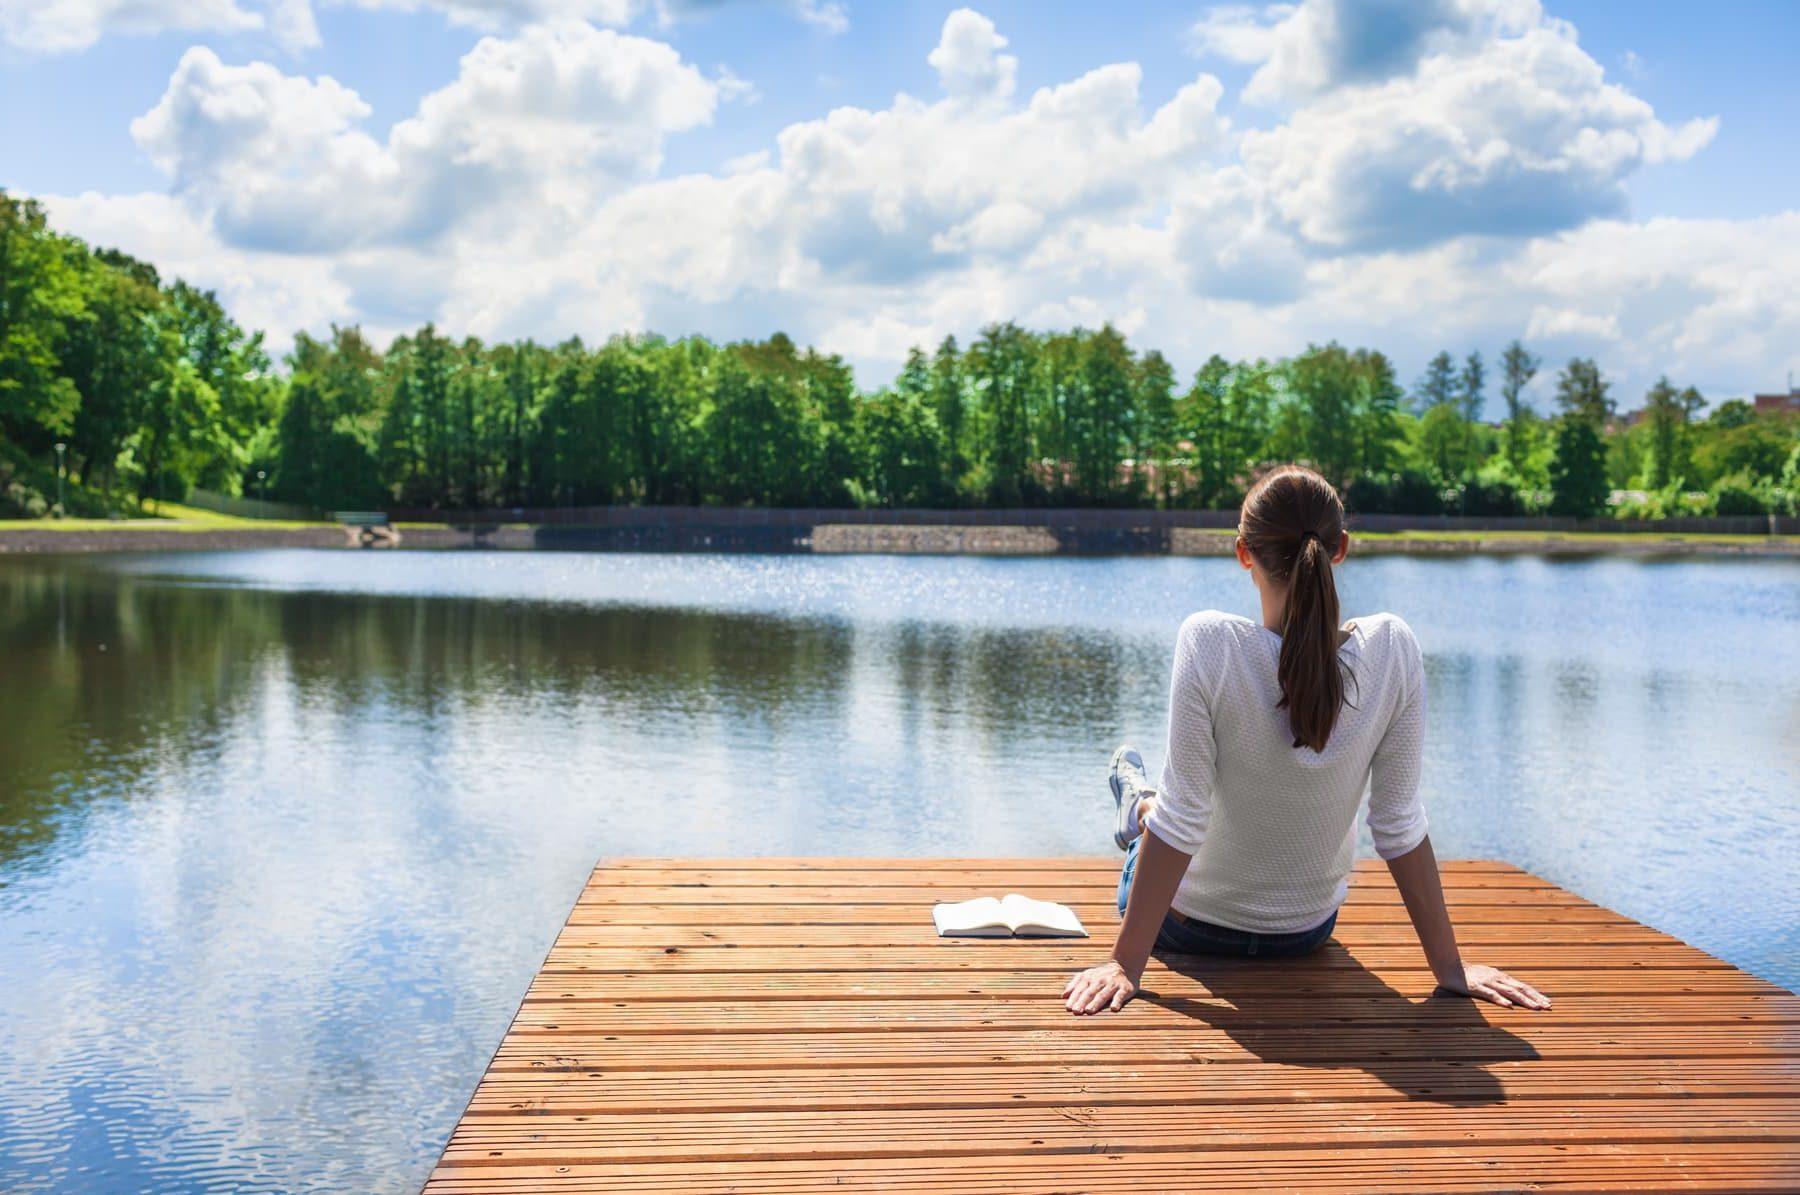 Woman relaxing by a beautiful lake.